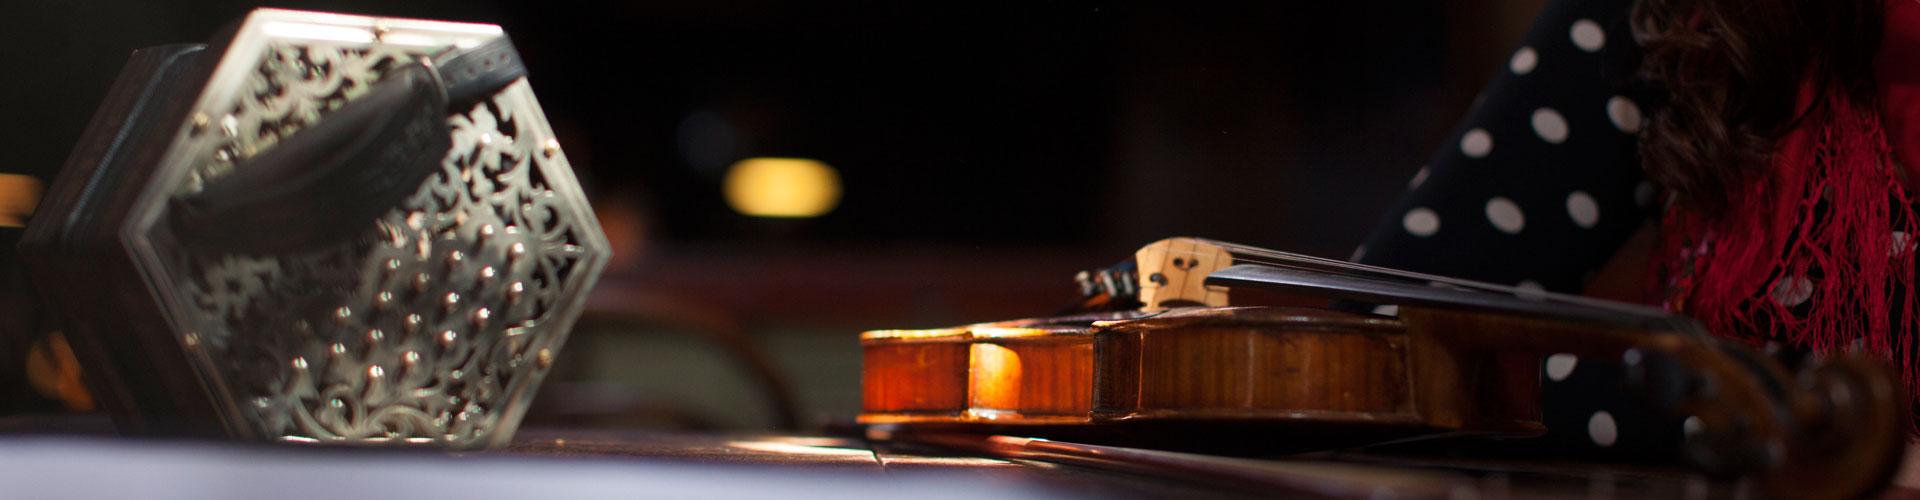 concertinafiddle.jpg